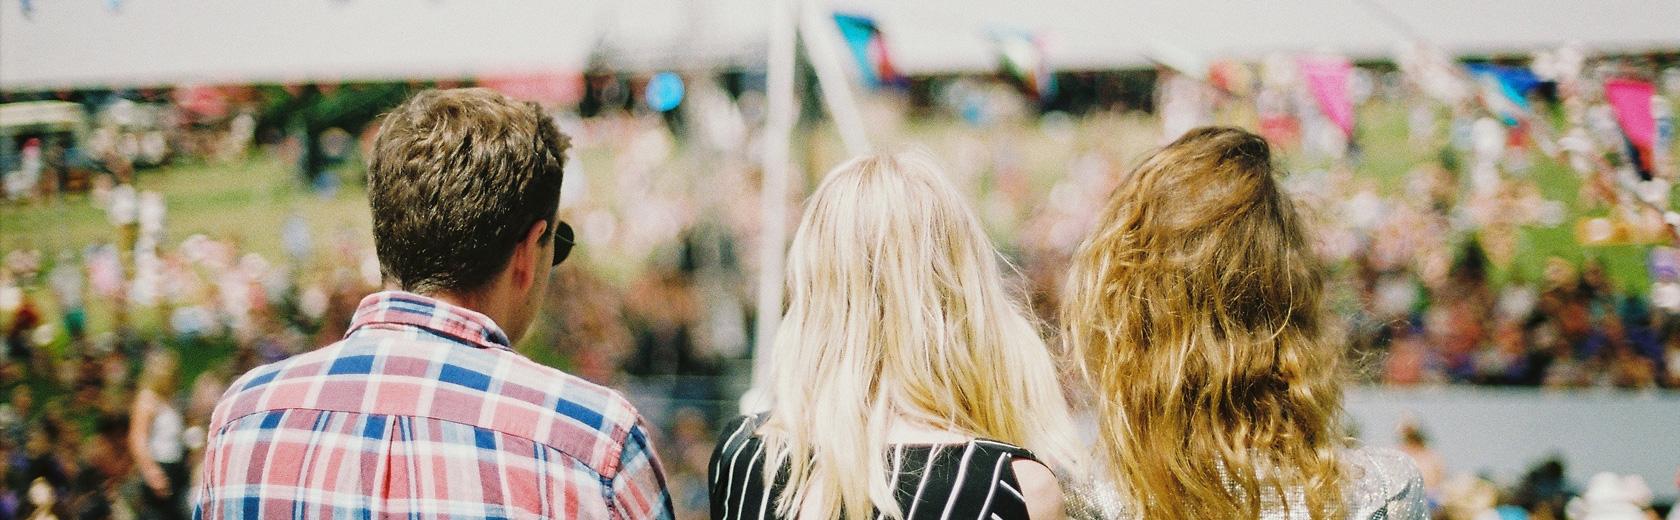 Creativando - Festivales